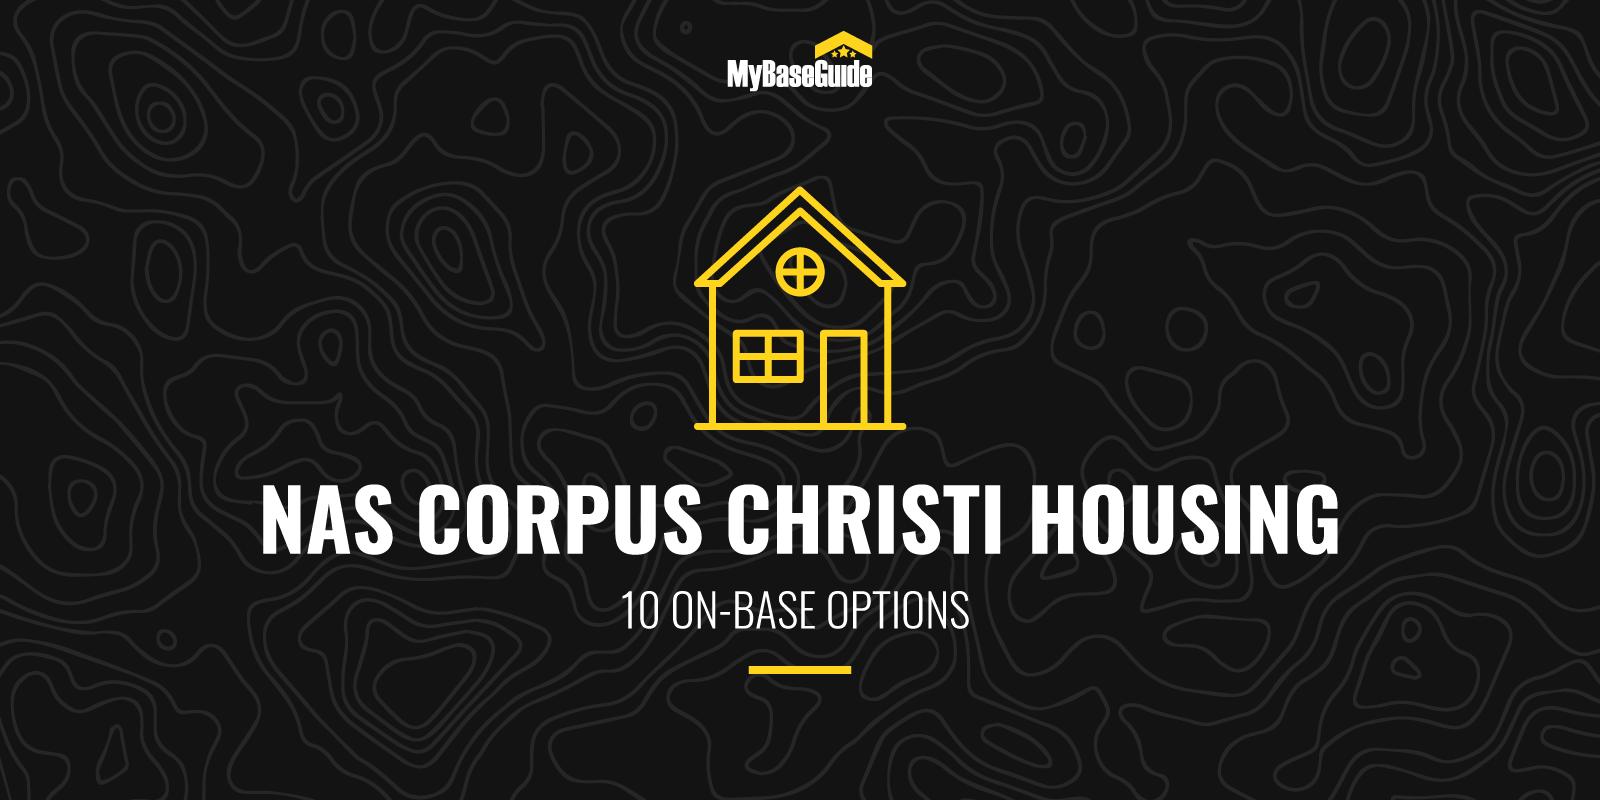 NAS Corpus Christi Housing: 10 On-Base Options